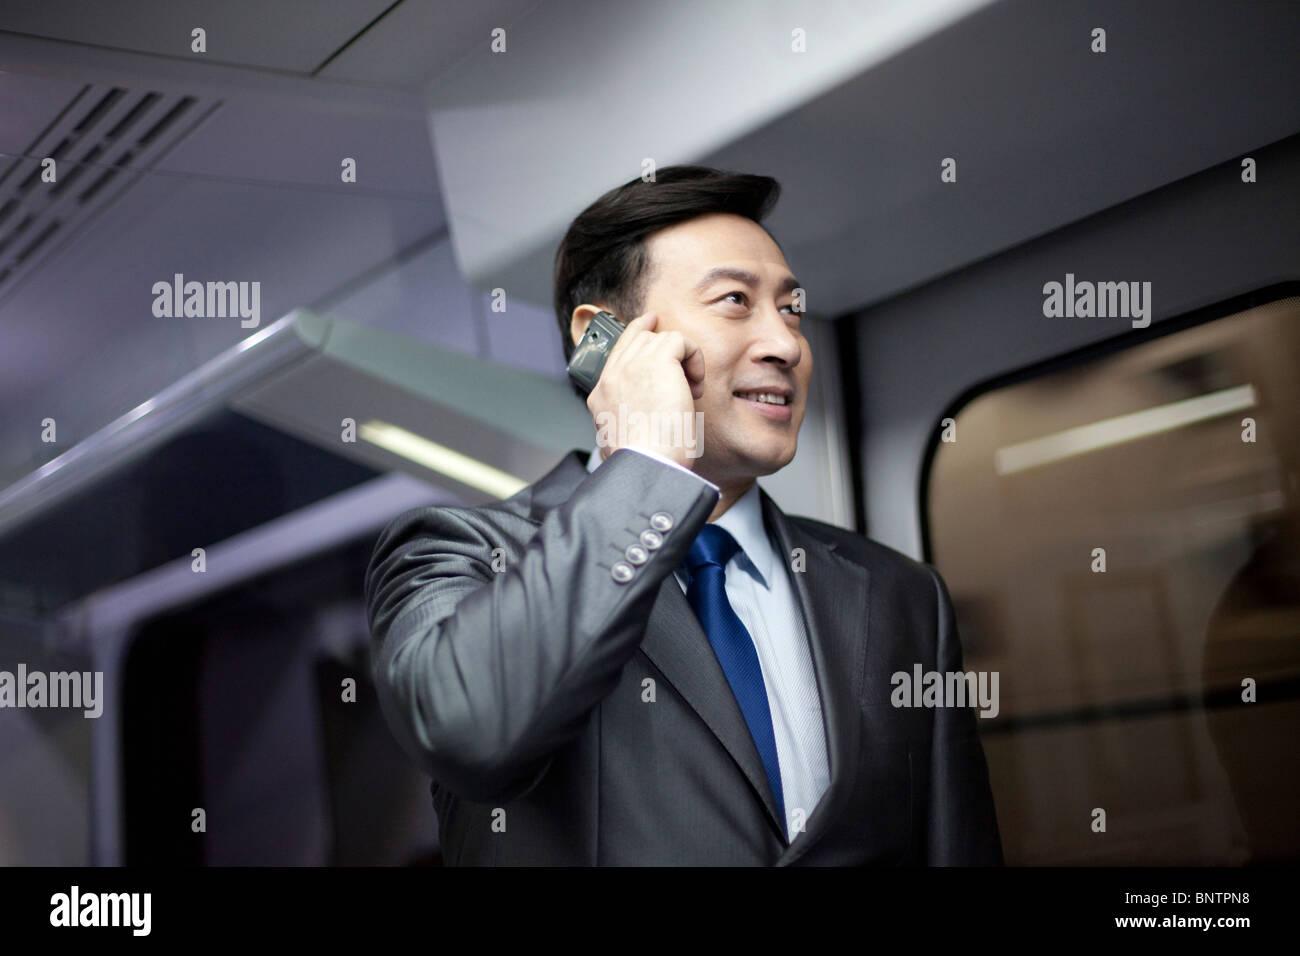 Businessman on the subway - Stock Image